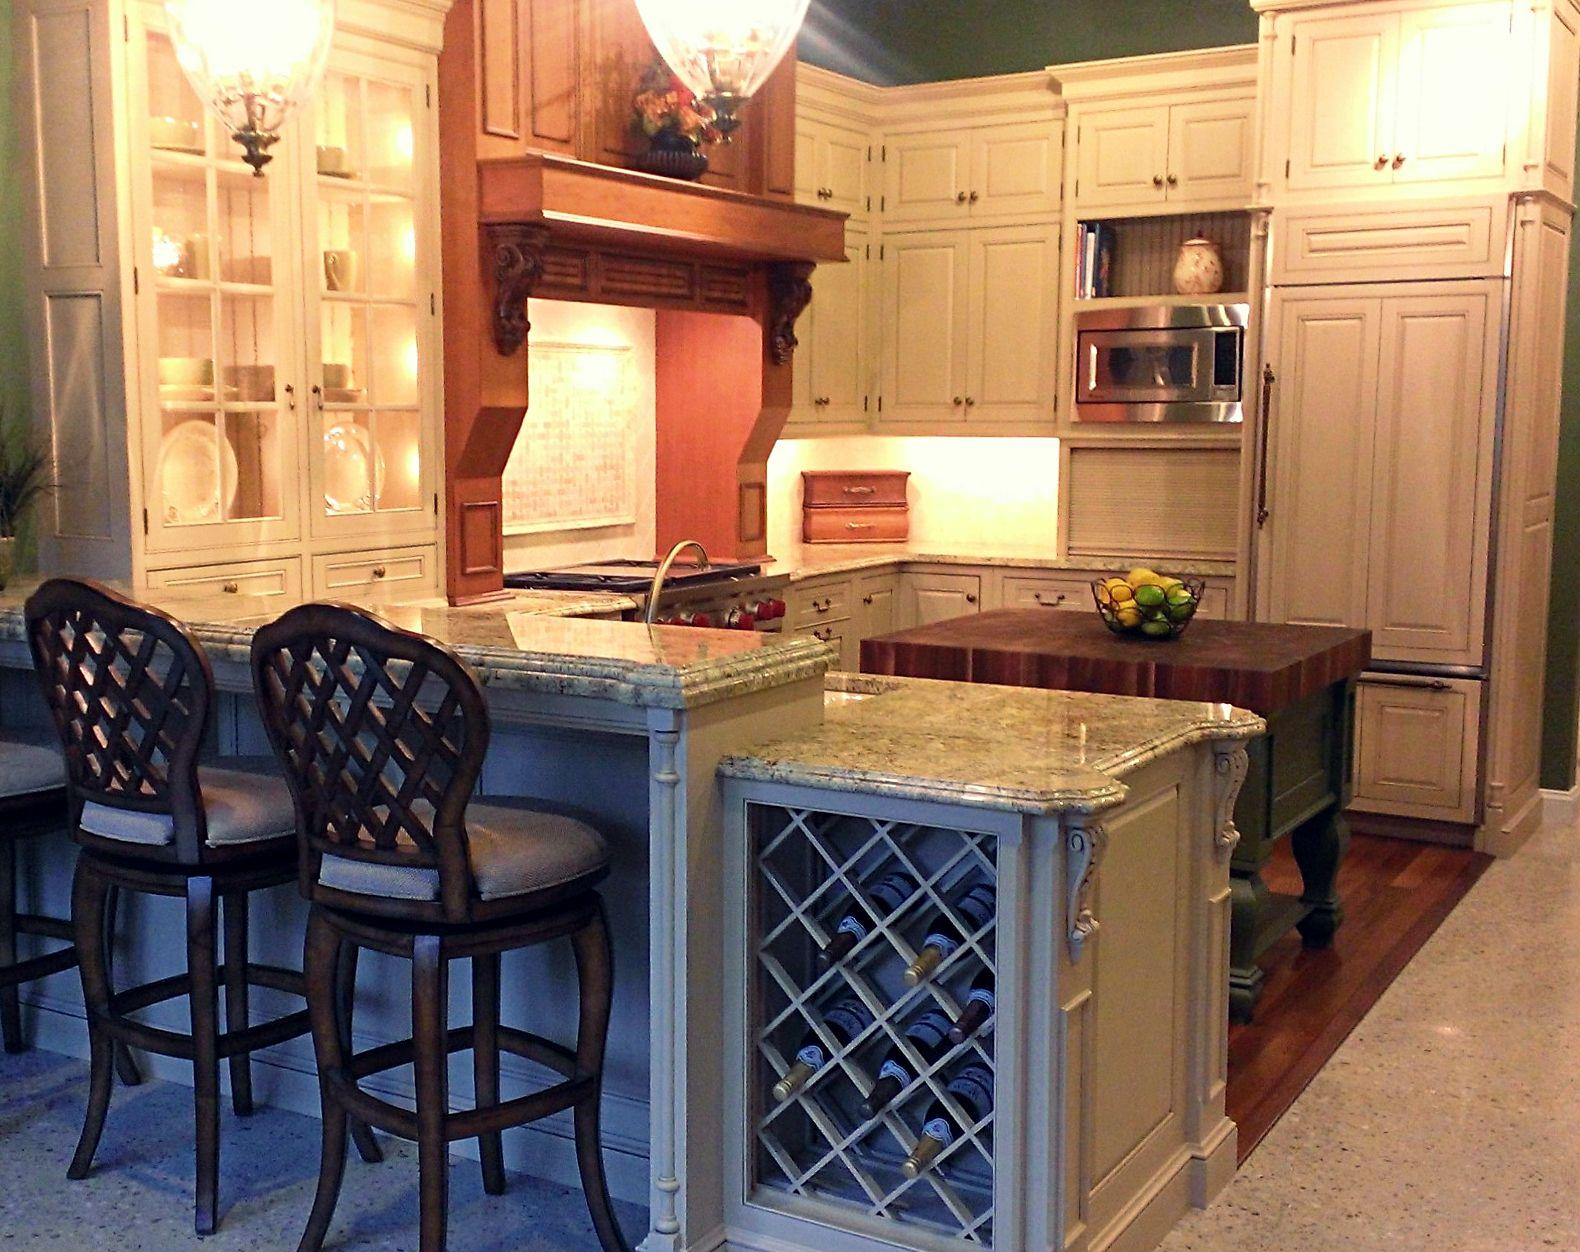 Elegant Rustic Kitchen Design Kenwood Kitchens In Lutherville Maryland Two Tone Kitchen Cabin Rustic Kitchen Rustic Kitchen Design Kitchen Remodel Design